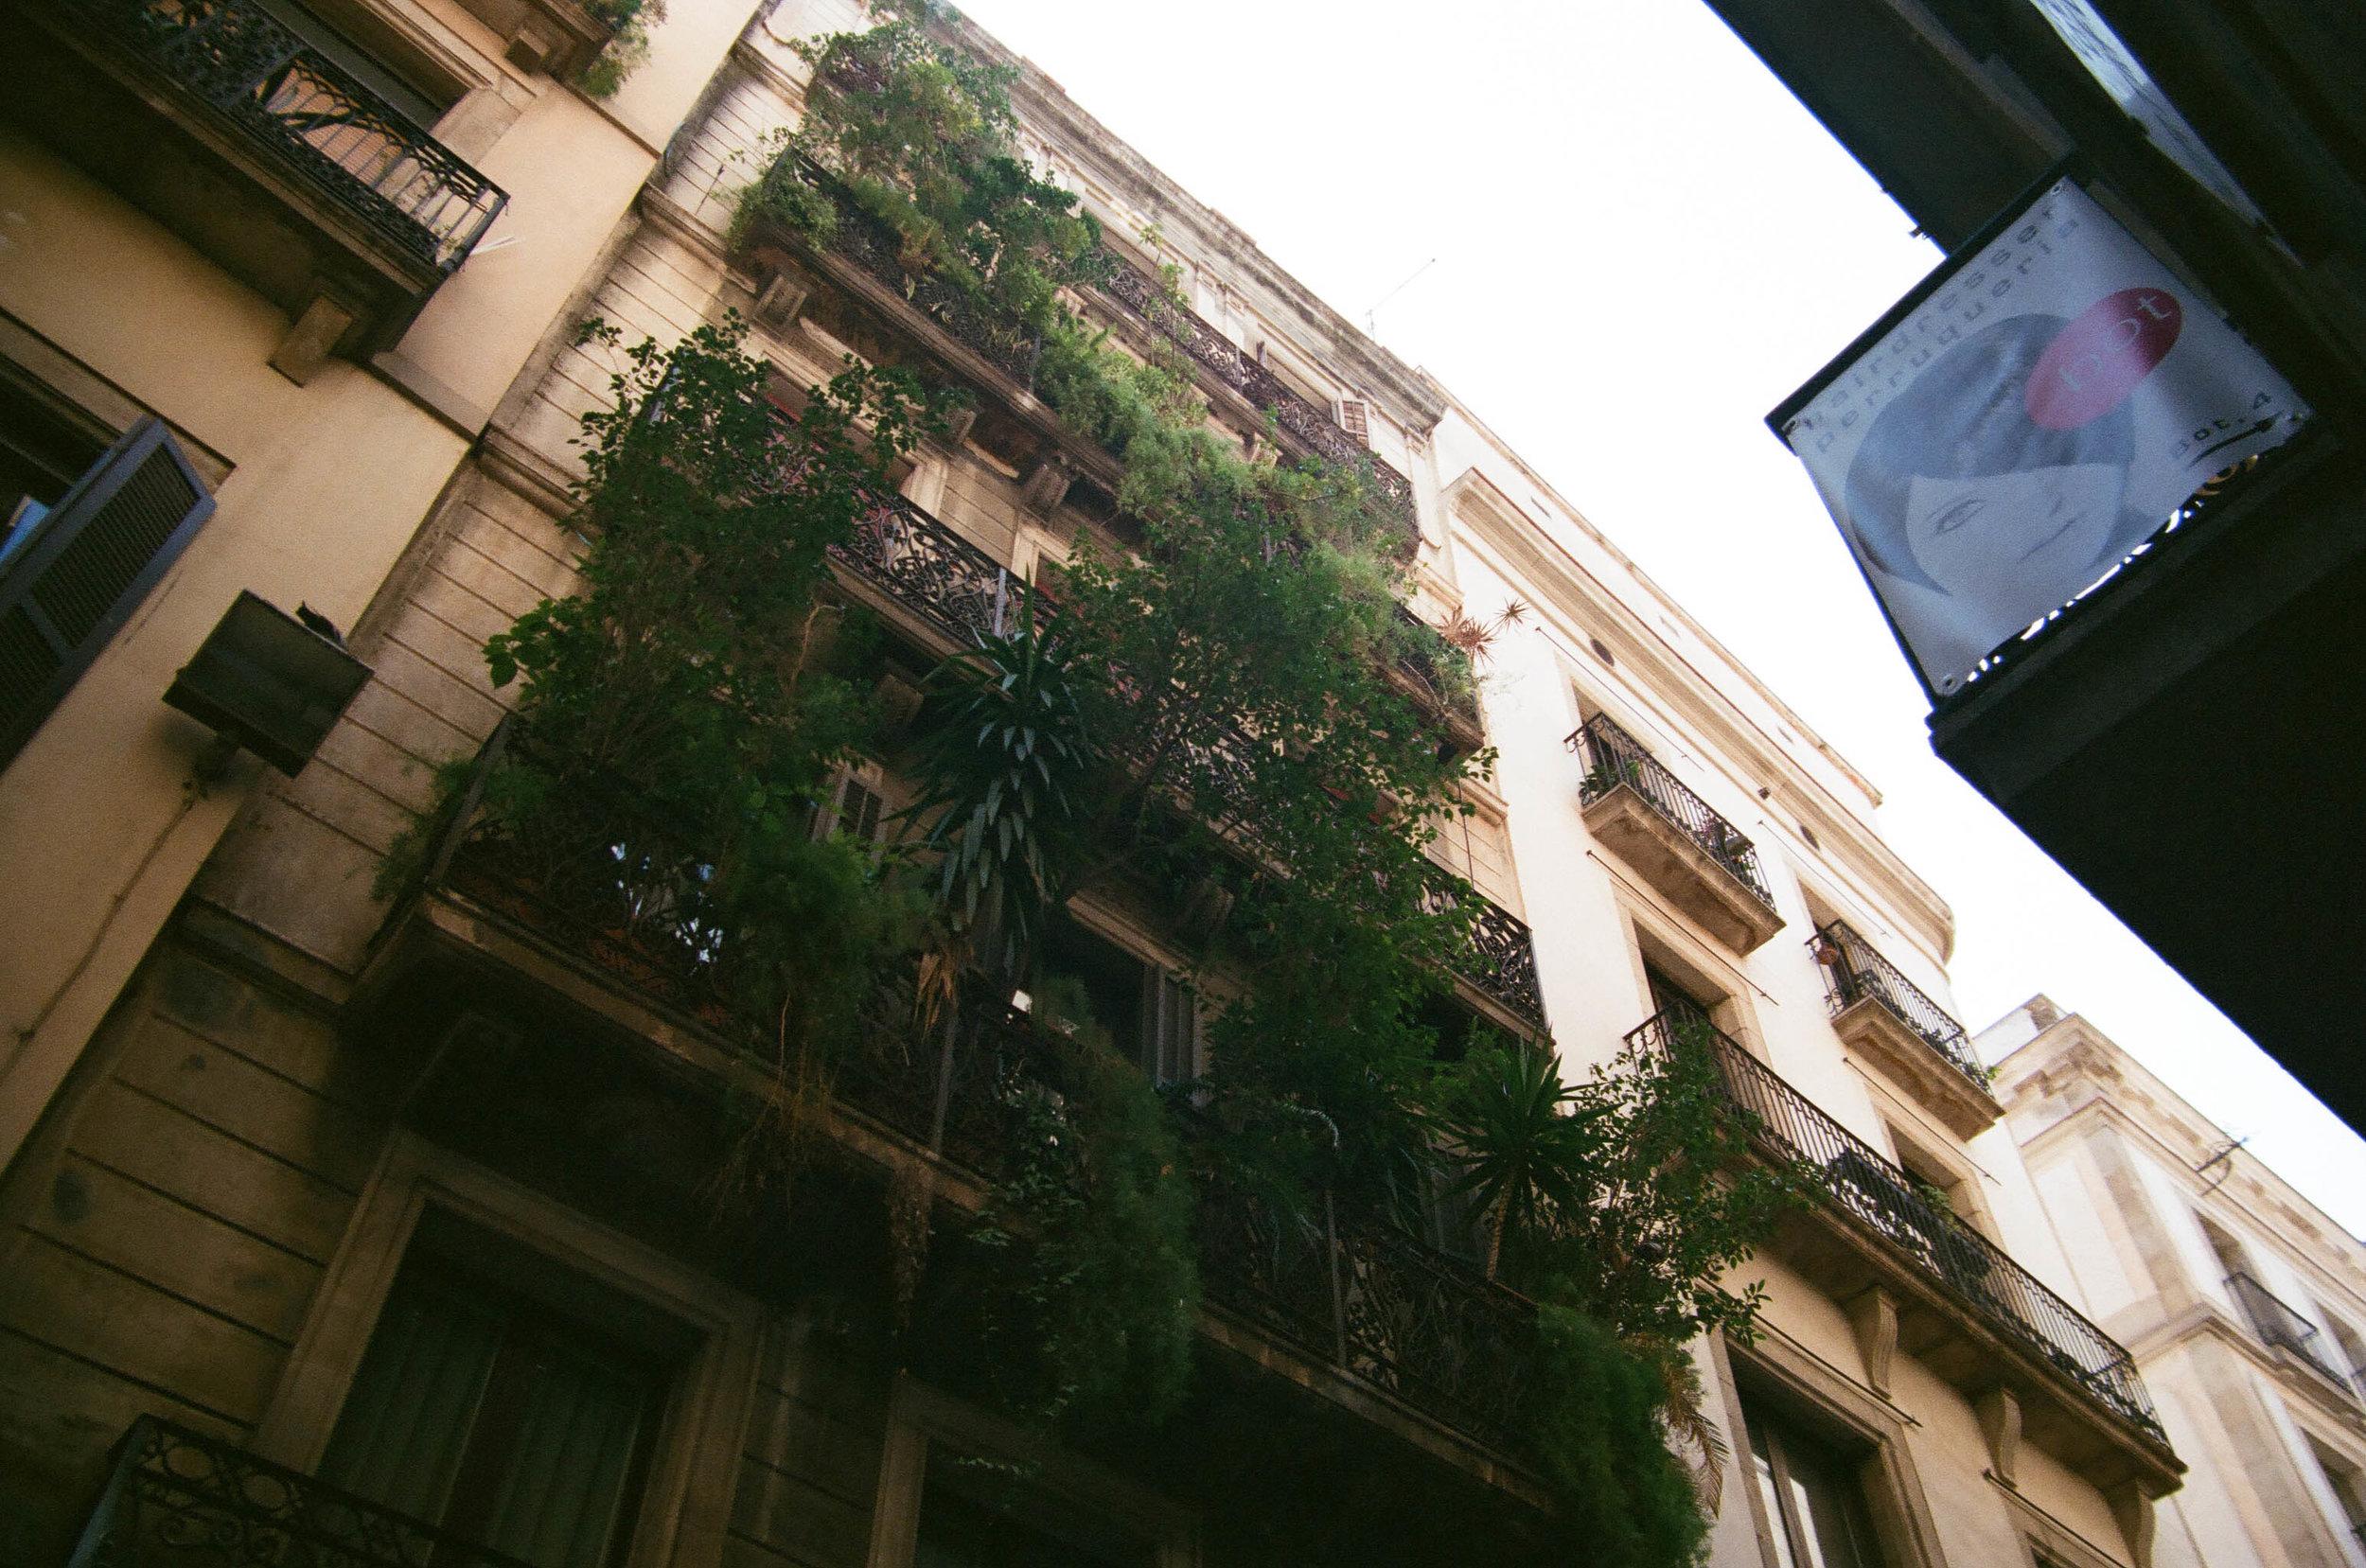 Barcelona_39.jpg